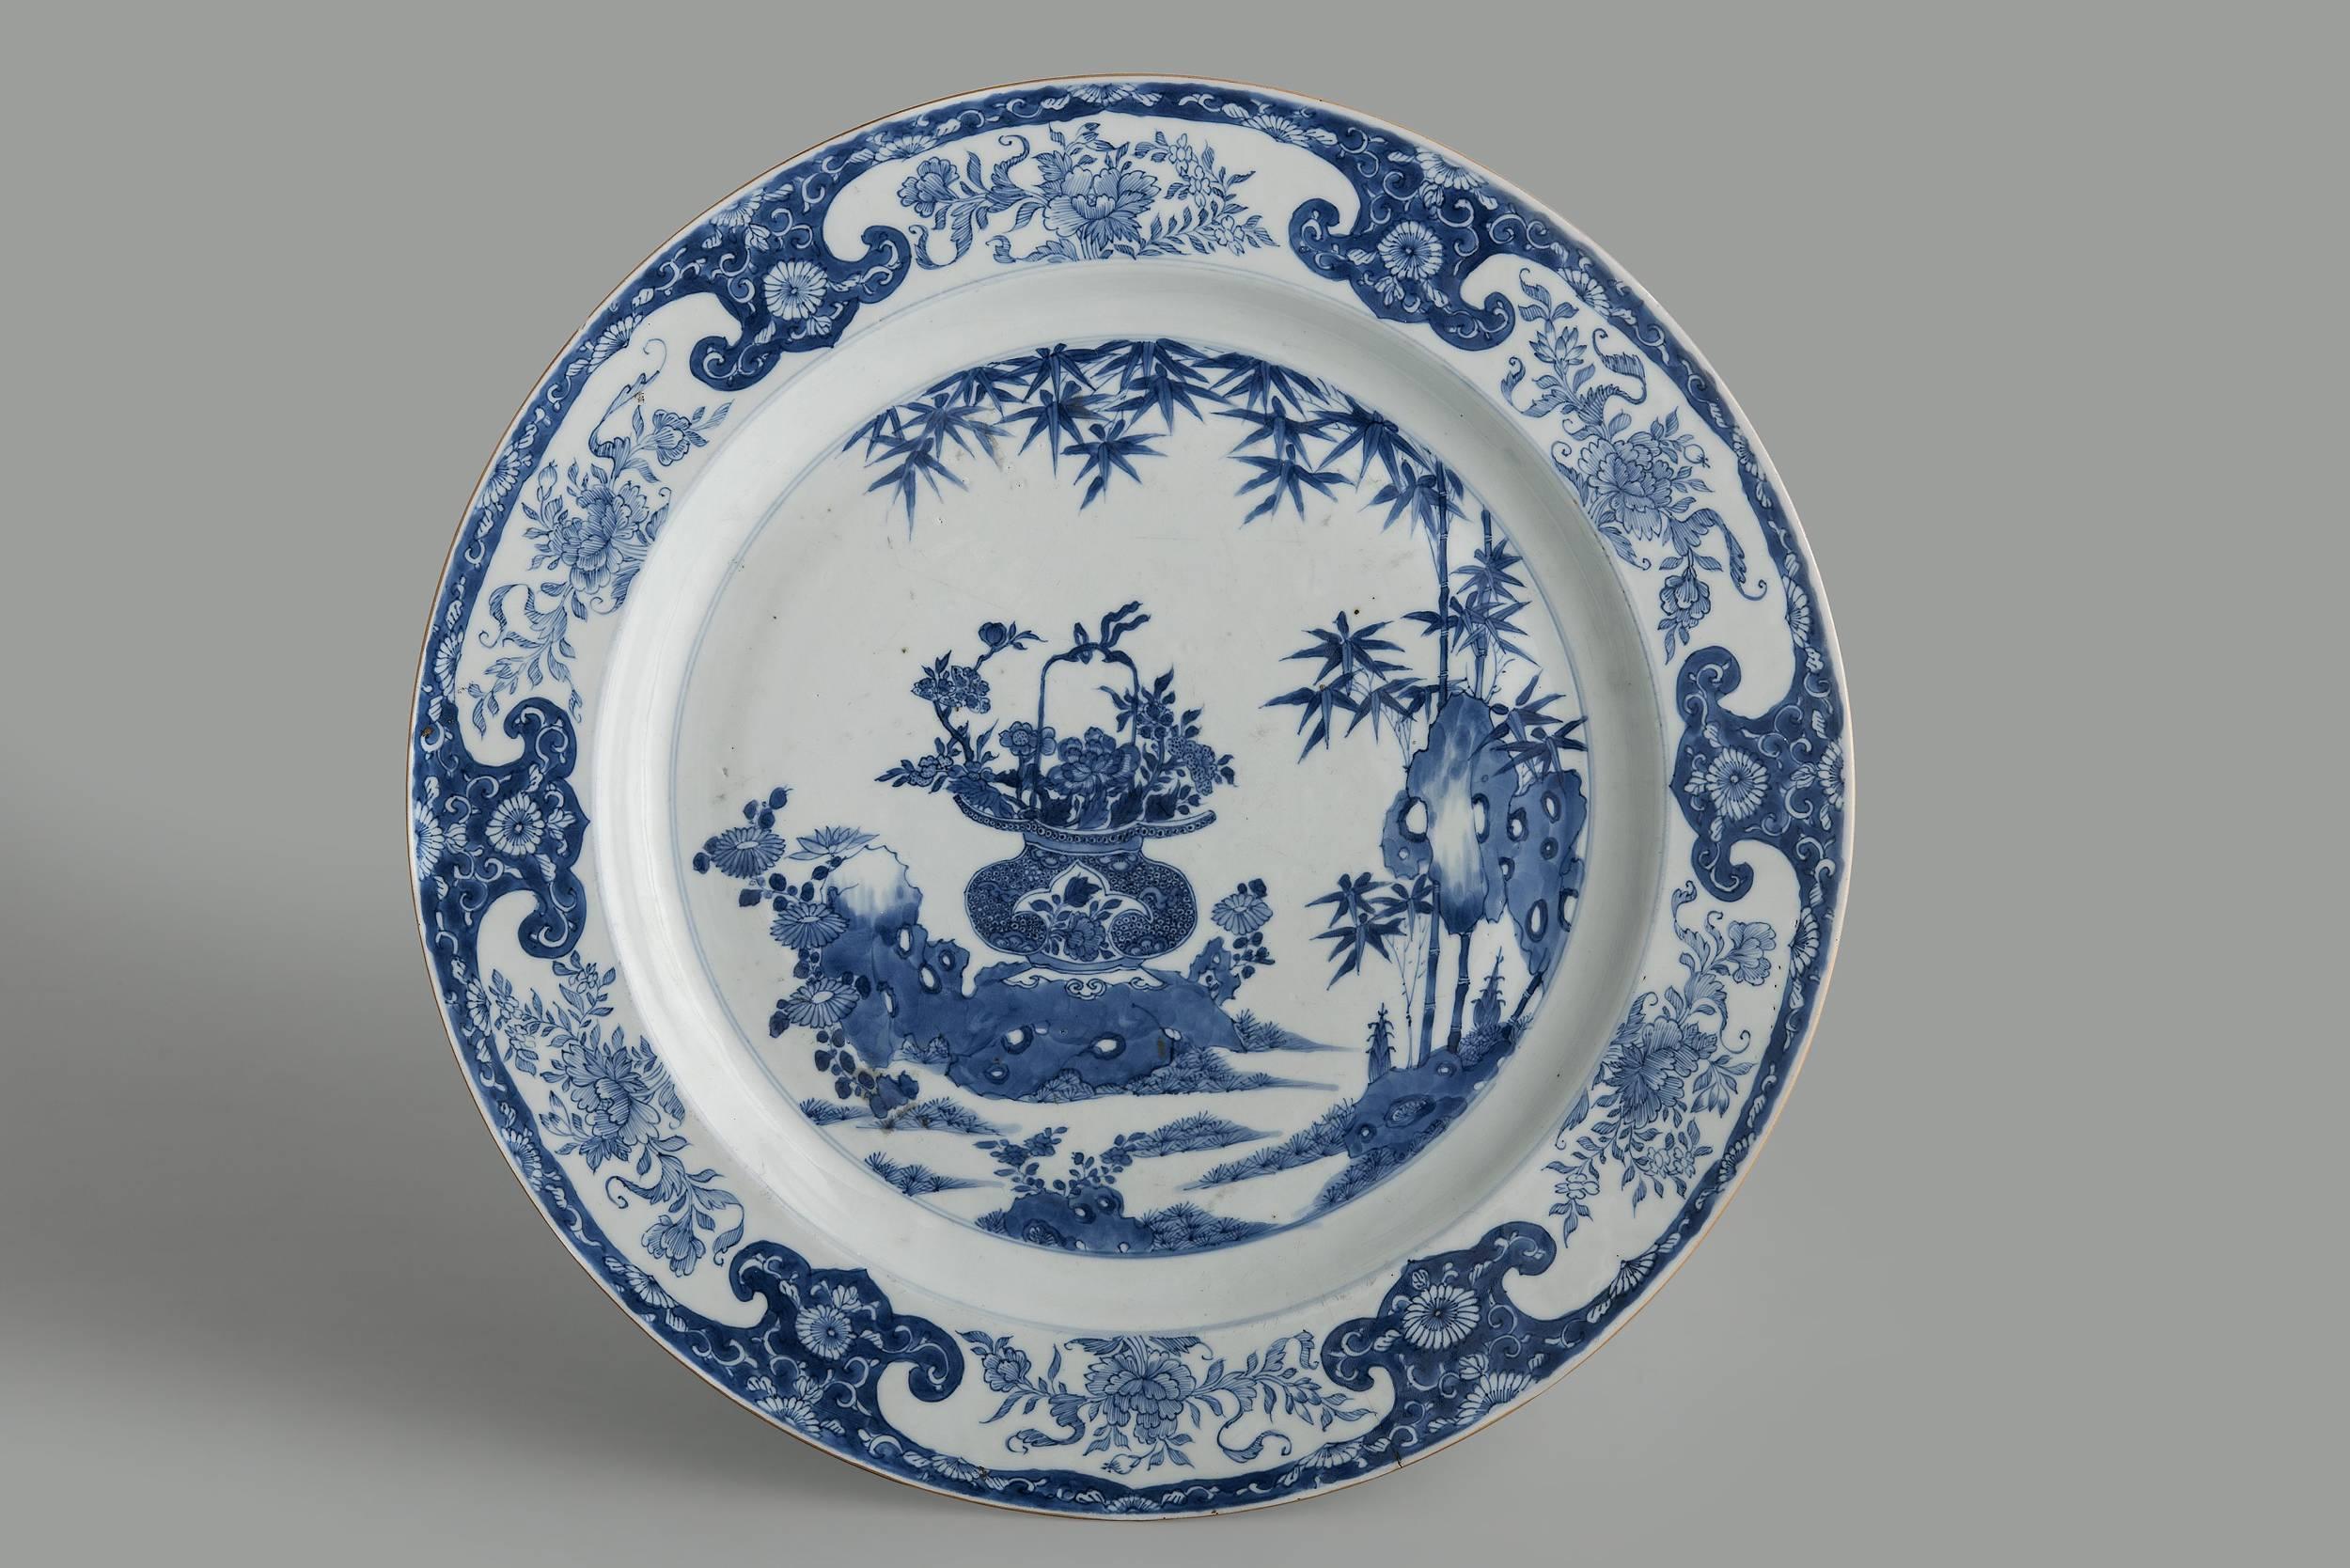 Decorative platter, 1st half of the 18th century